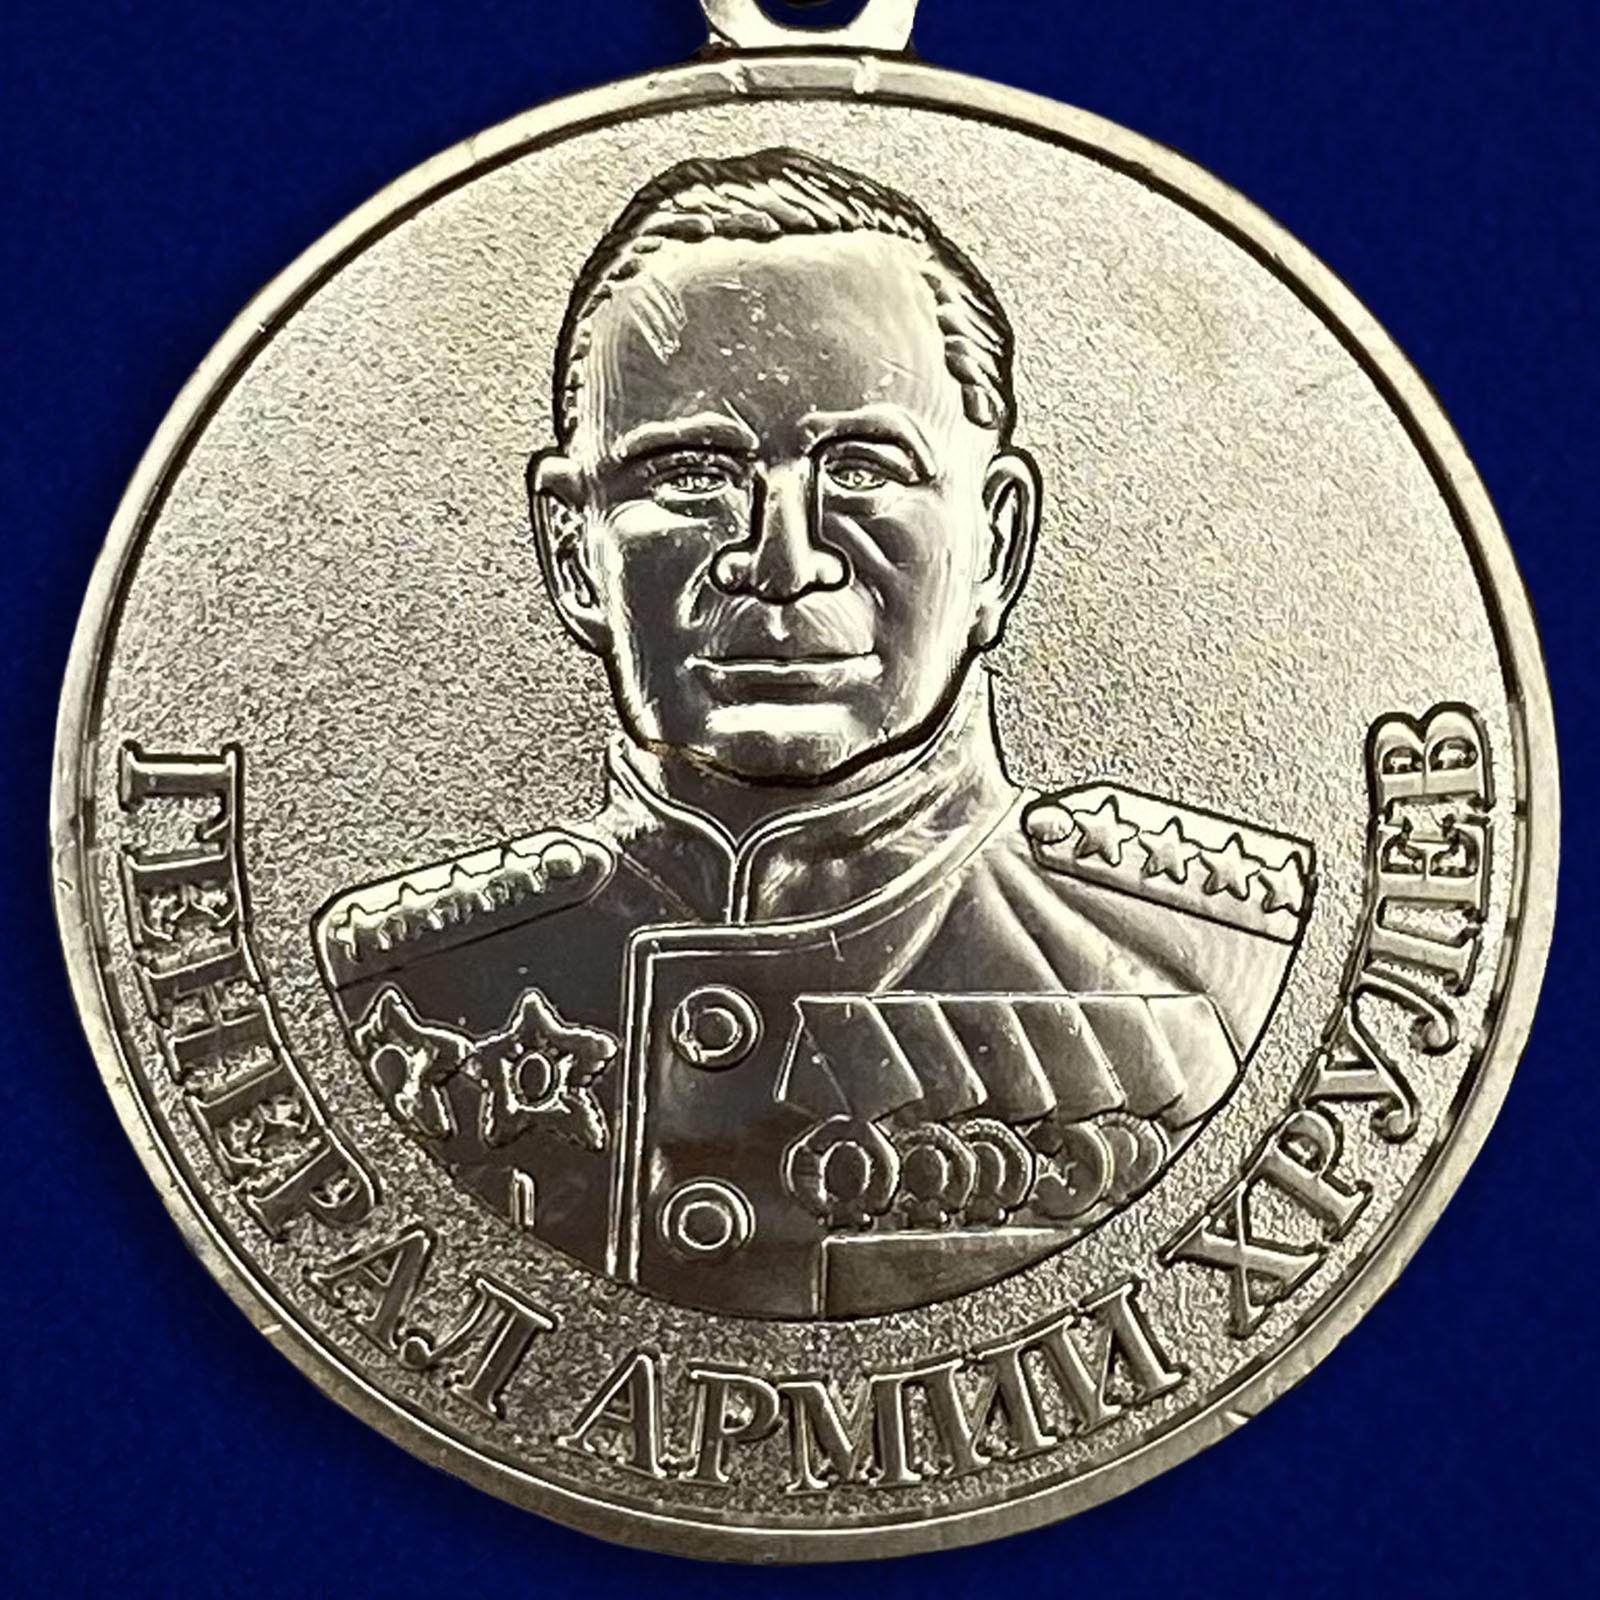 Описание медали «Генерал армии Хрулев» МО РФ